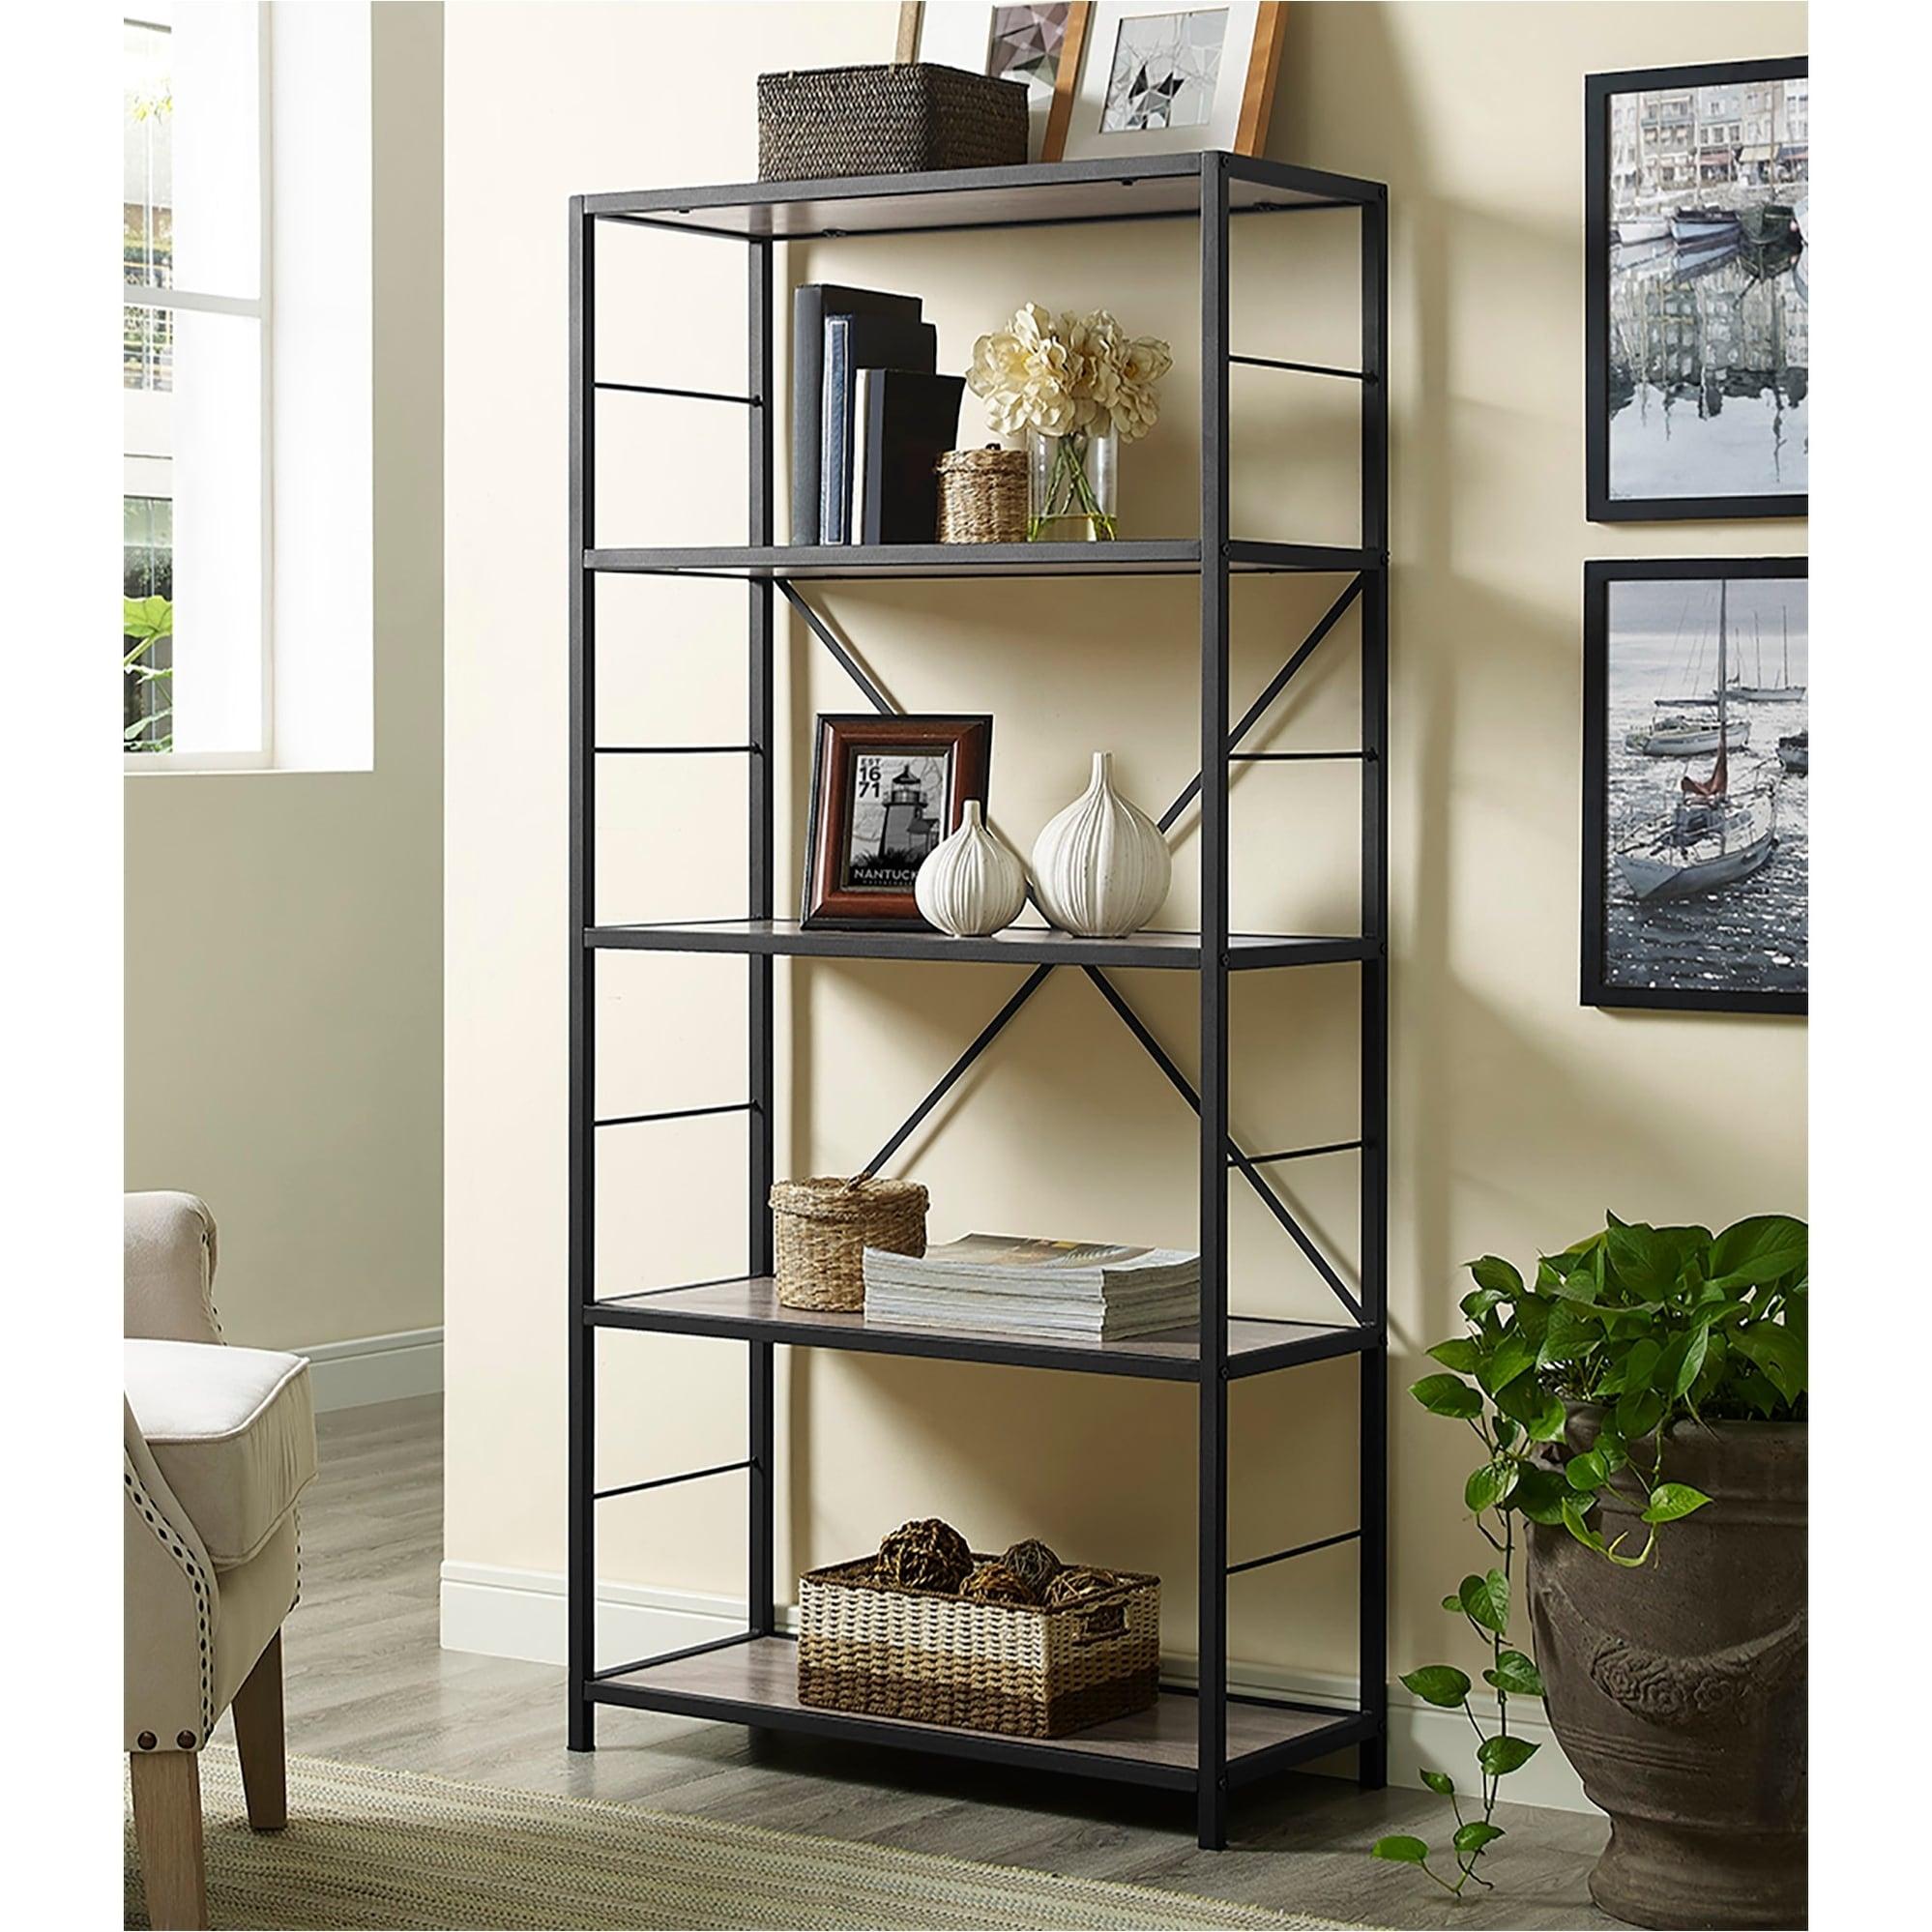 63 Inch Rustic Metal And Wood Bookshelf